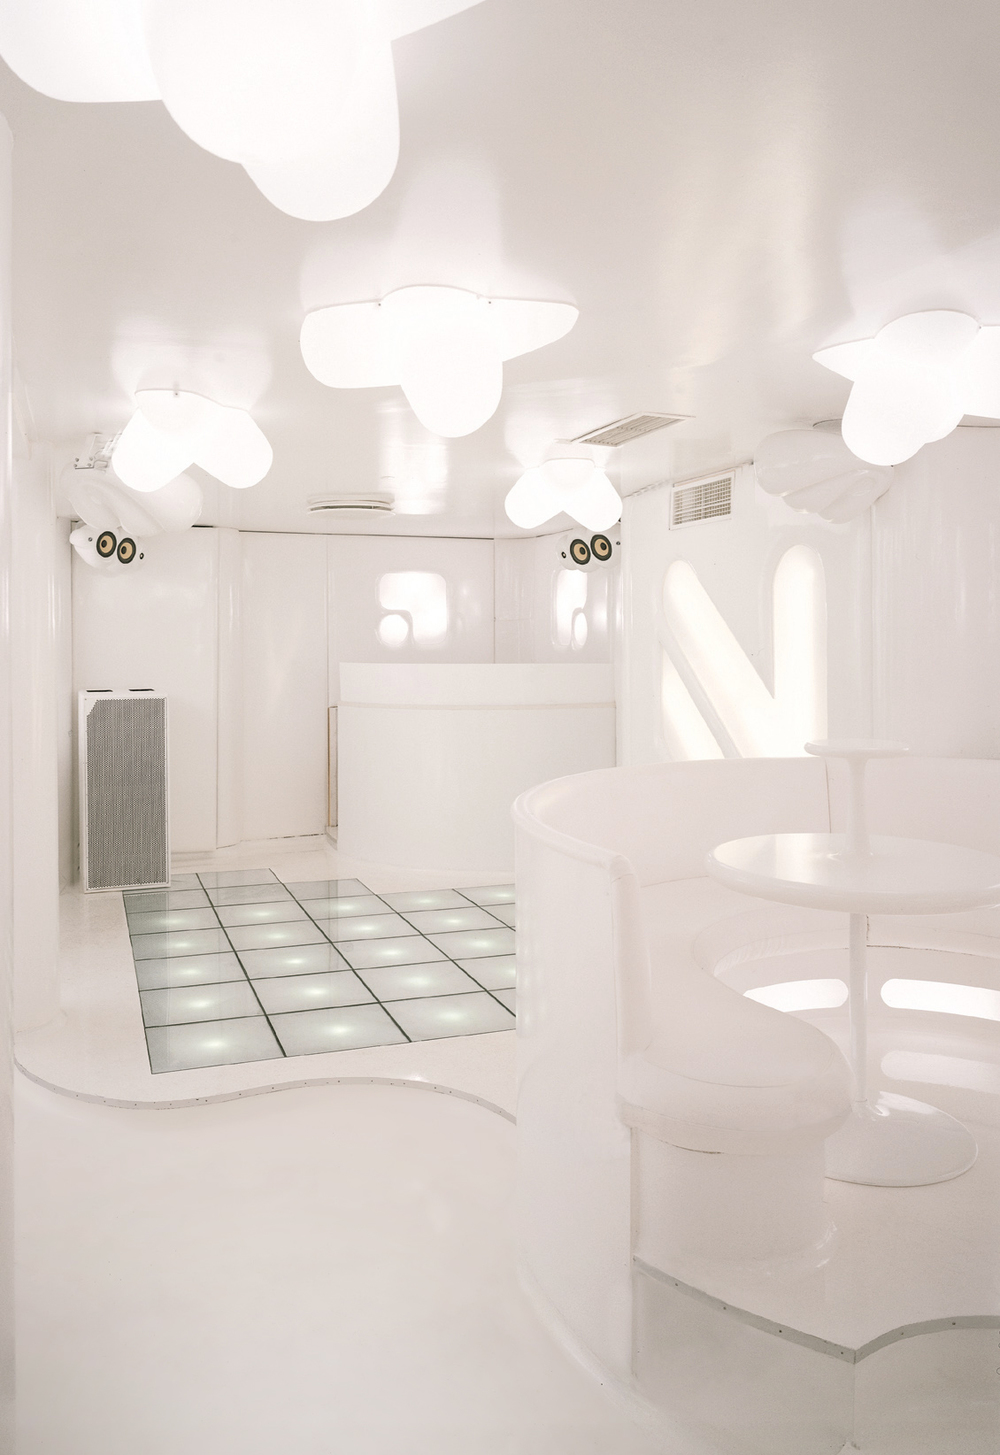 White interior design for NASA Nightclub designed by Johannes Torpe Studios